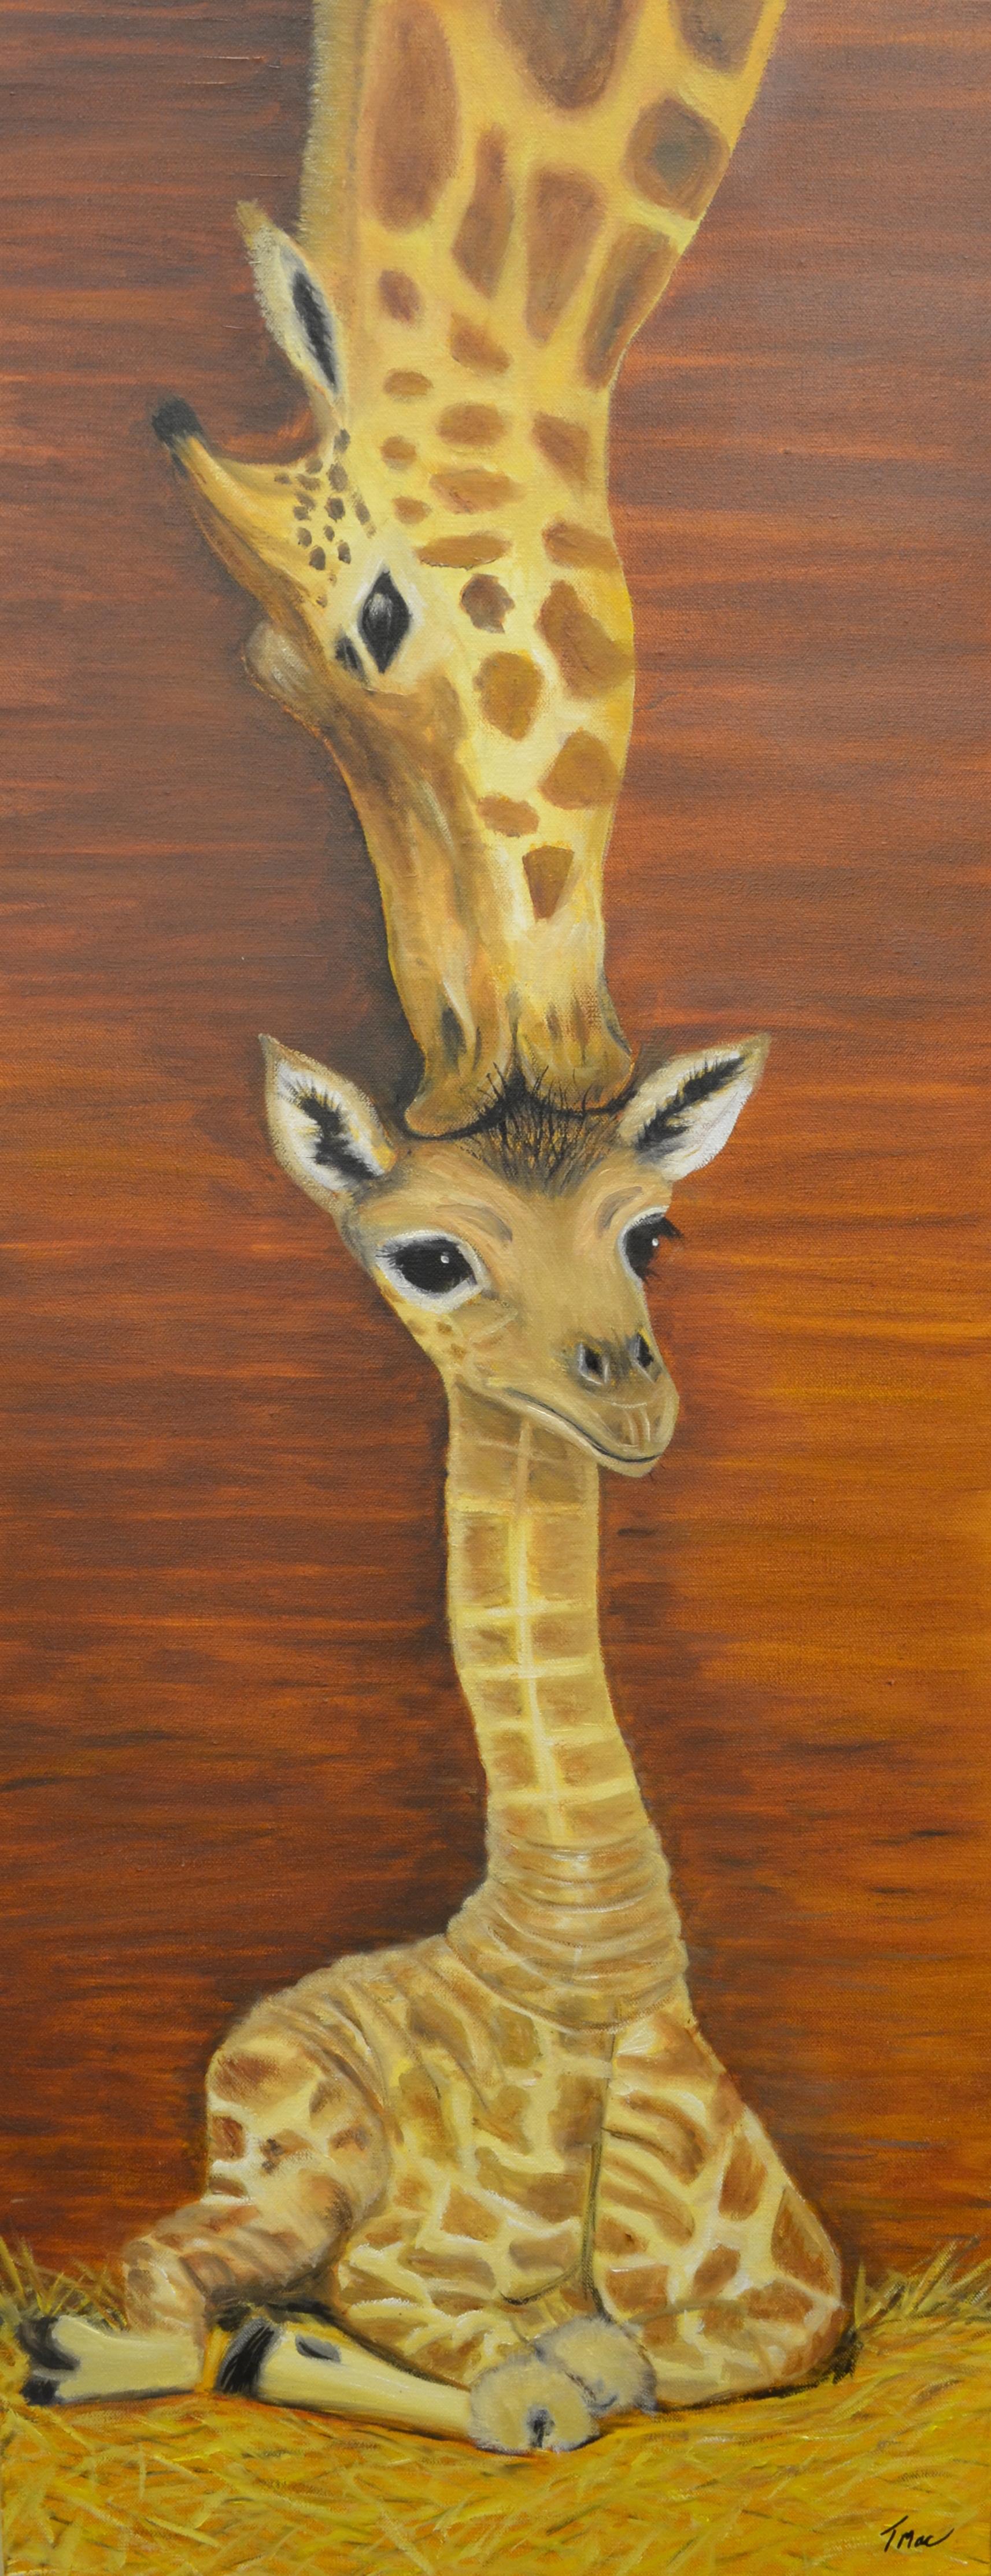 """Mommy & Me:Giraffes"" by Teresa McCarthy, 30x14in, oil on canvas (2016), $425 | BUY NOW"